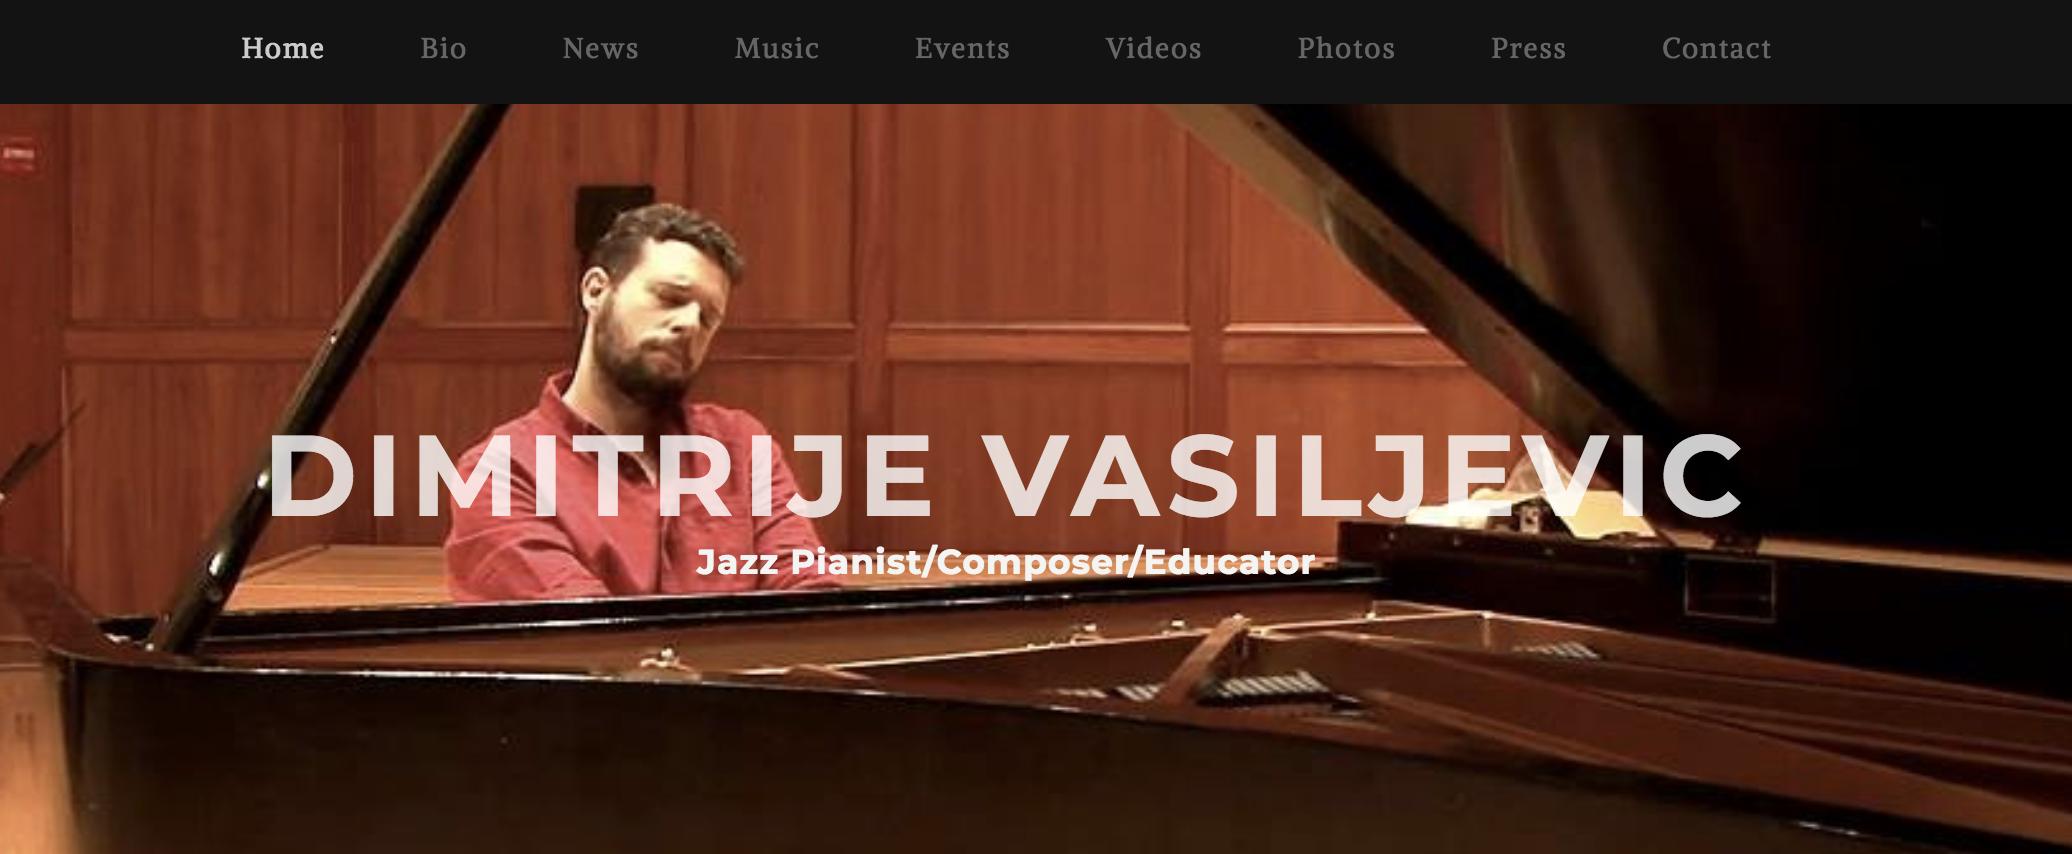 www.dimitrijevasiljevic.com